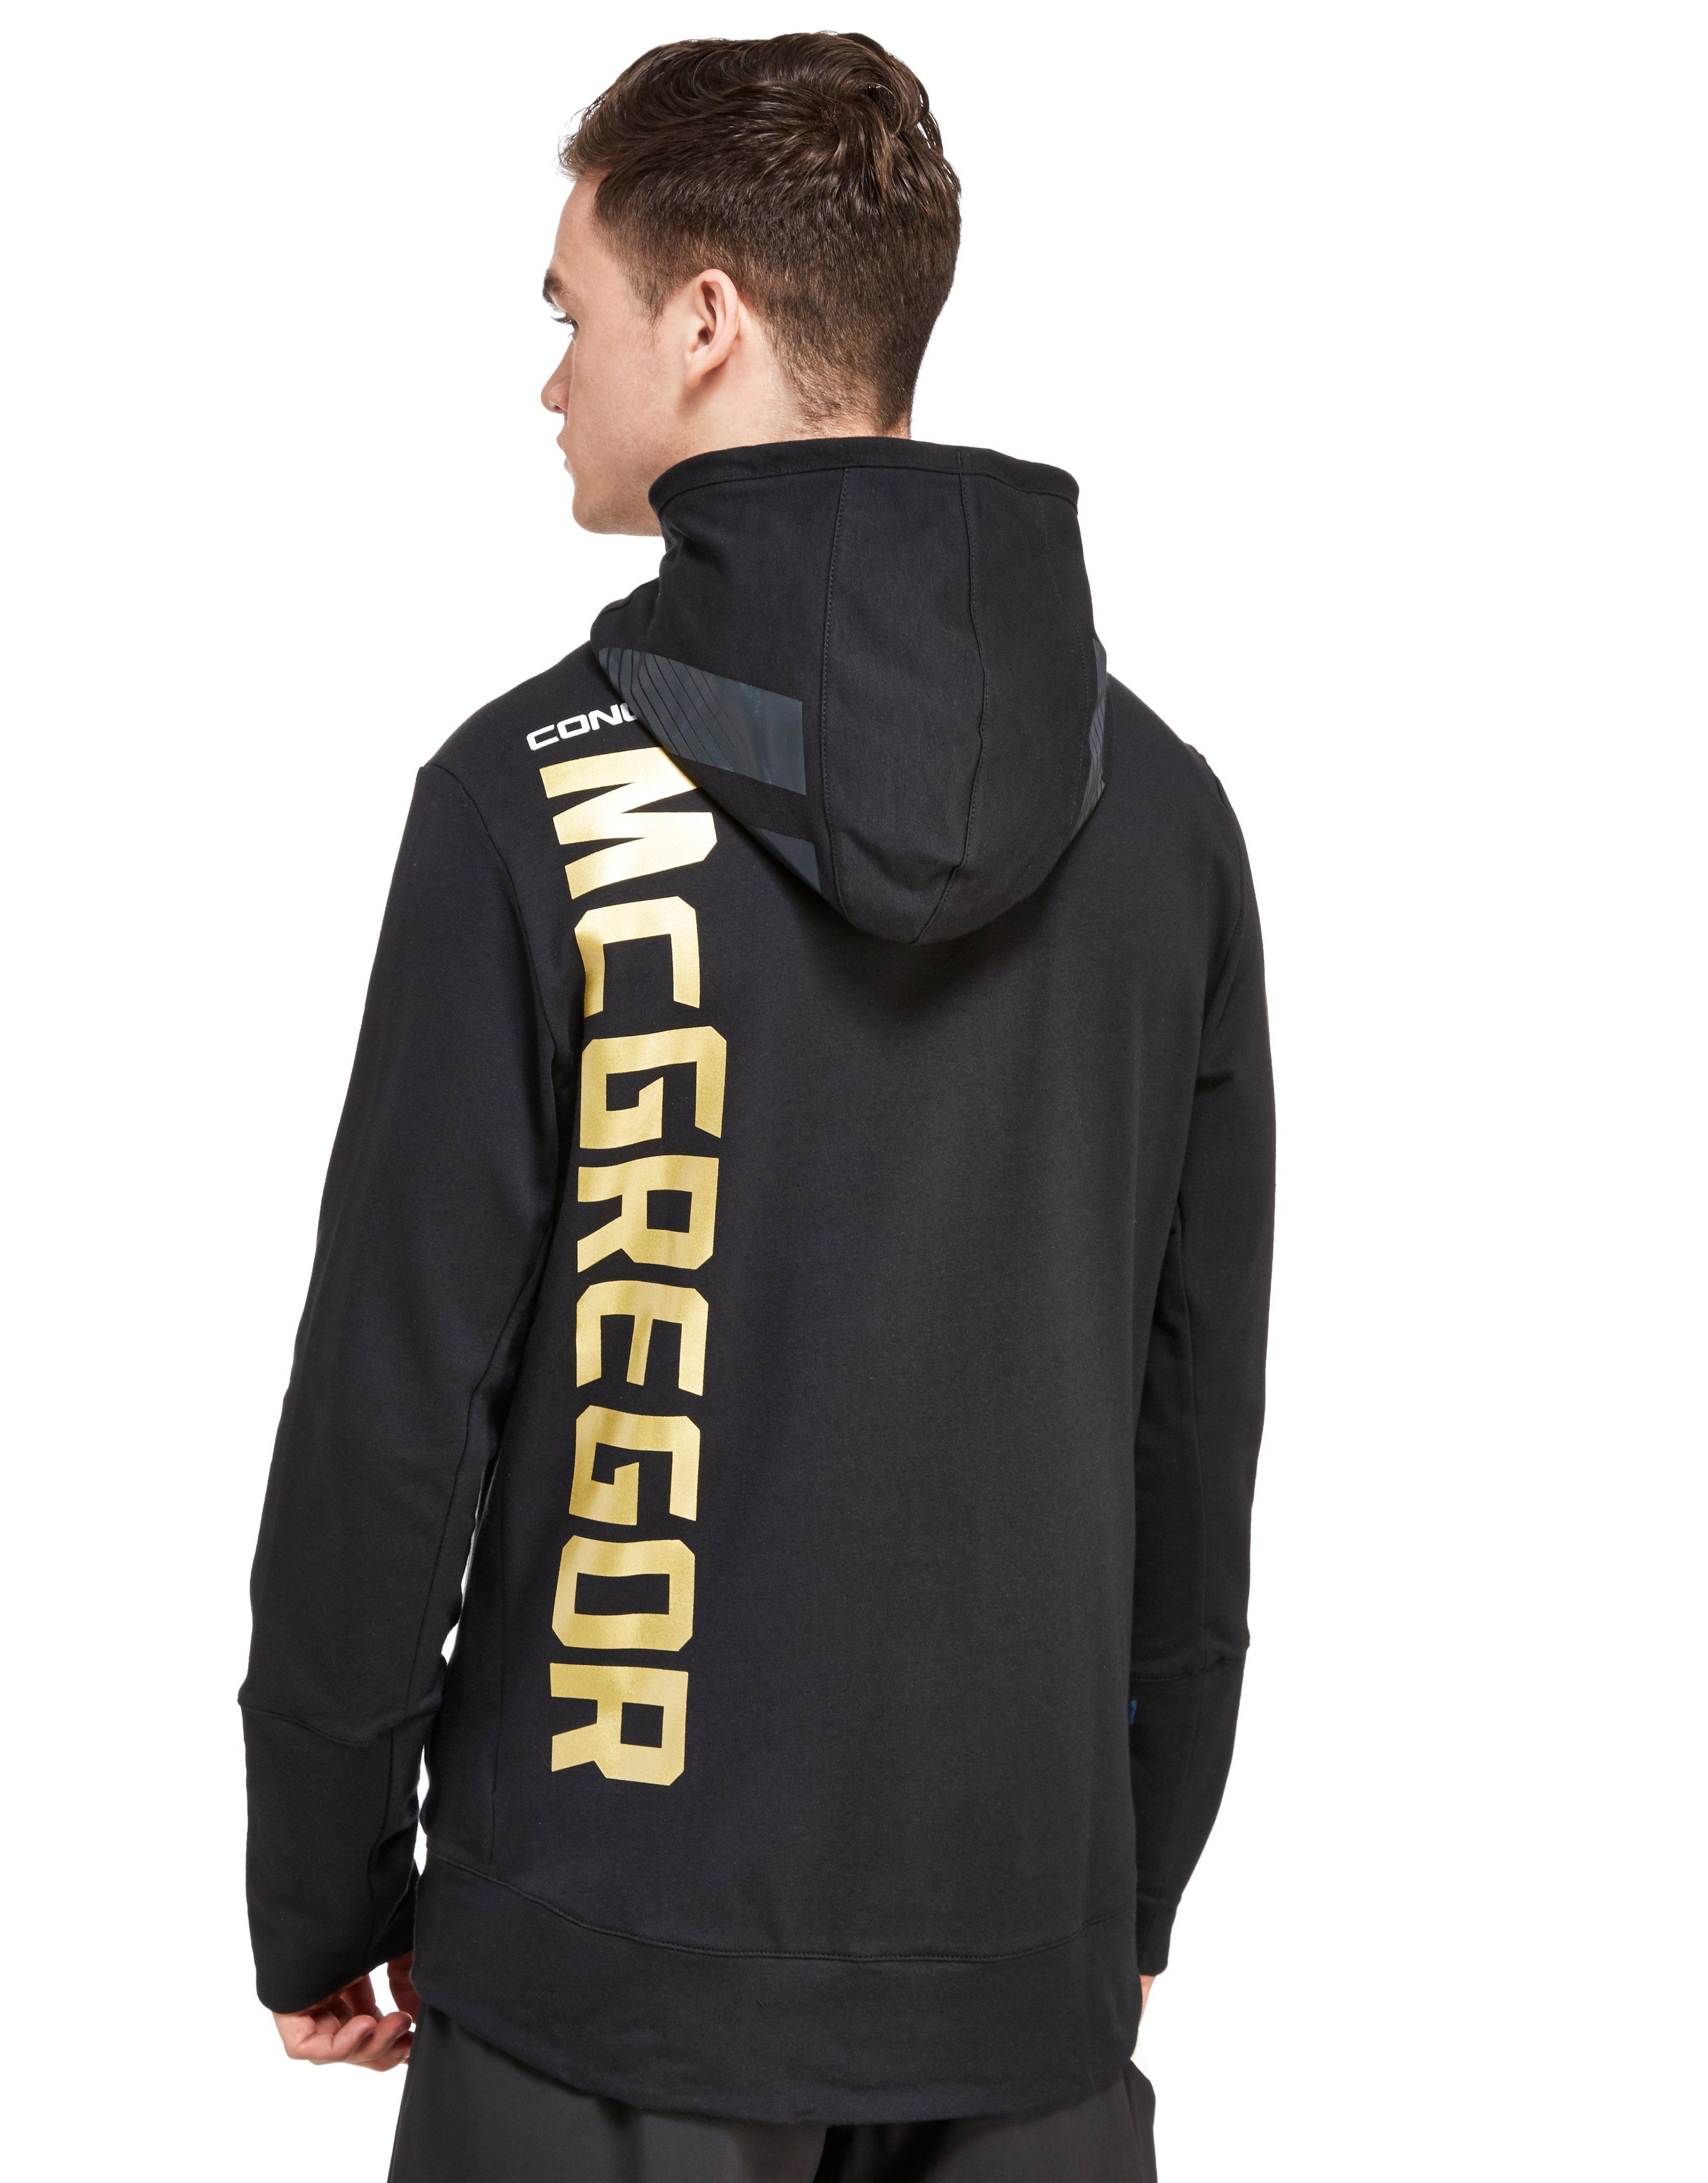 1f80689f82 Reebok Ufc Conor Mcgregor Walkout Hoody in Black for Men - Lyst